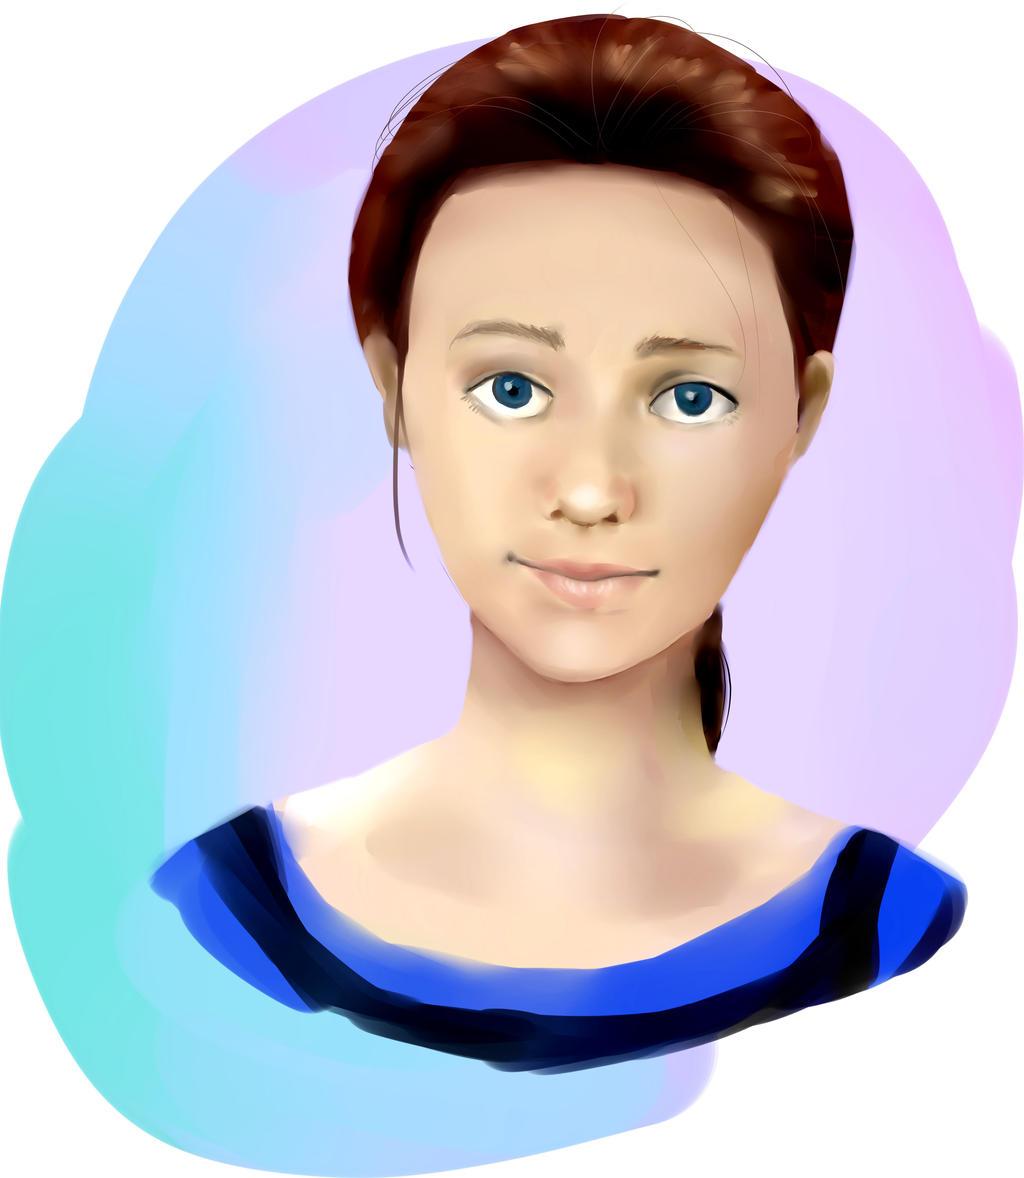 hpmoofrog's Profile Picture